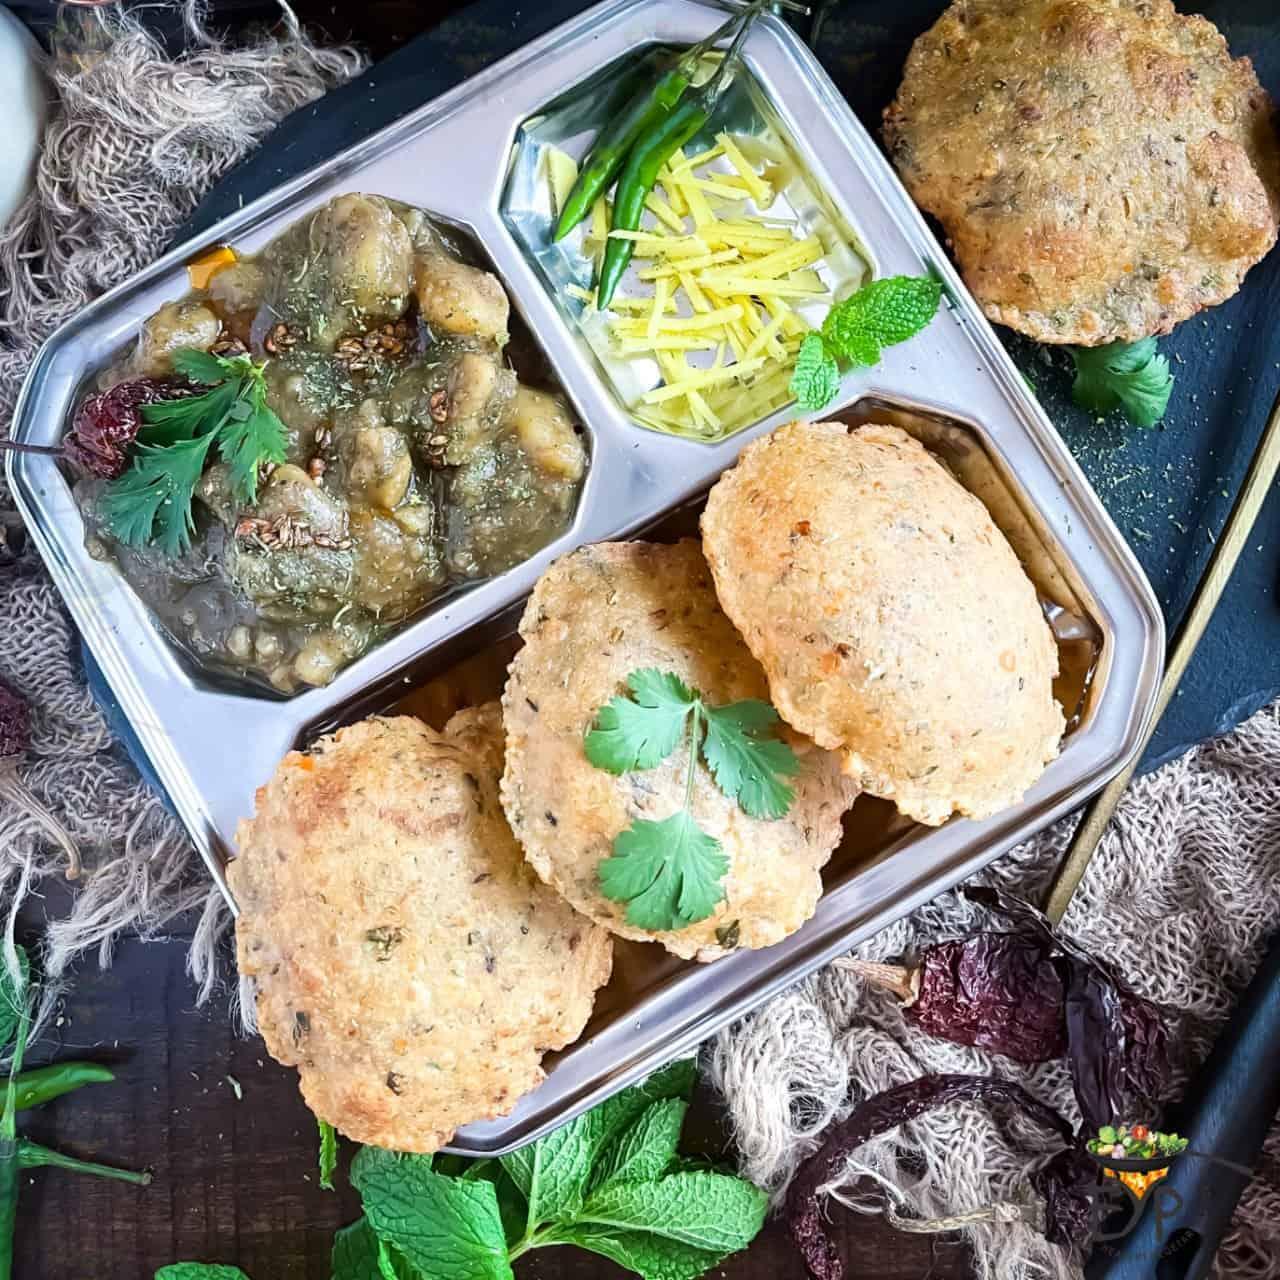 Dubki wale aloo served with bhedai (stuffed lentil deepfried bread)